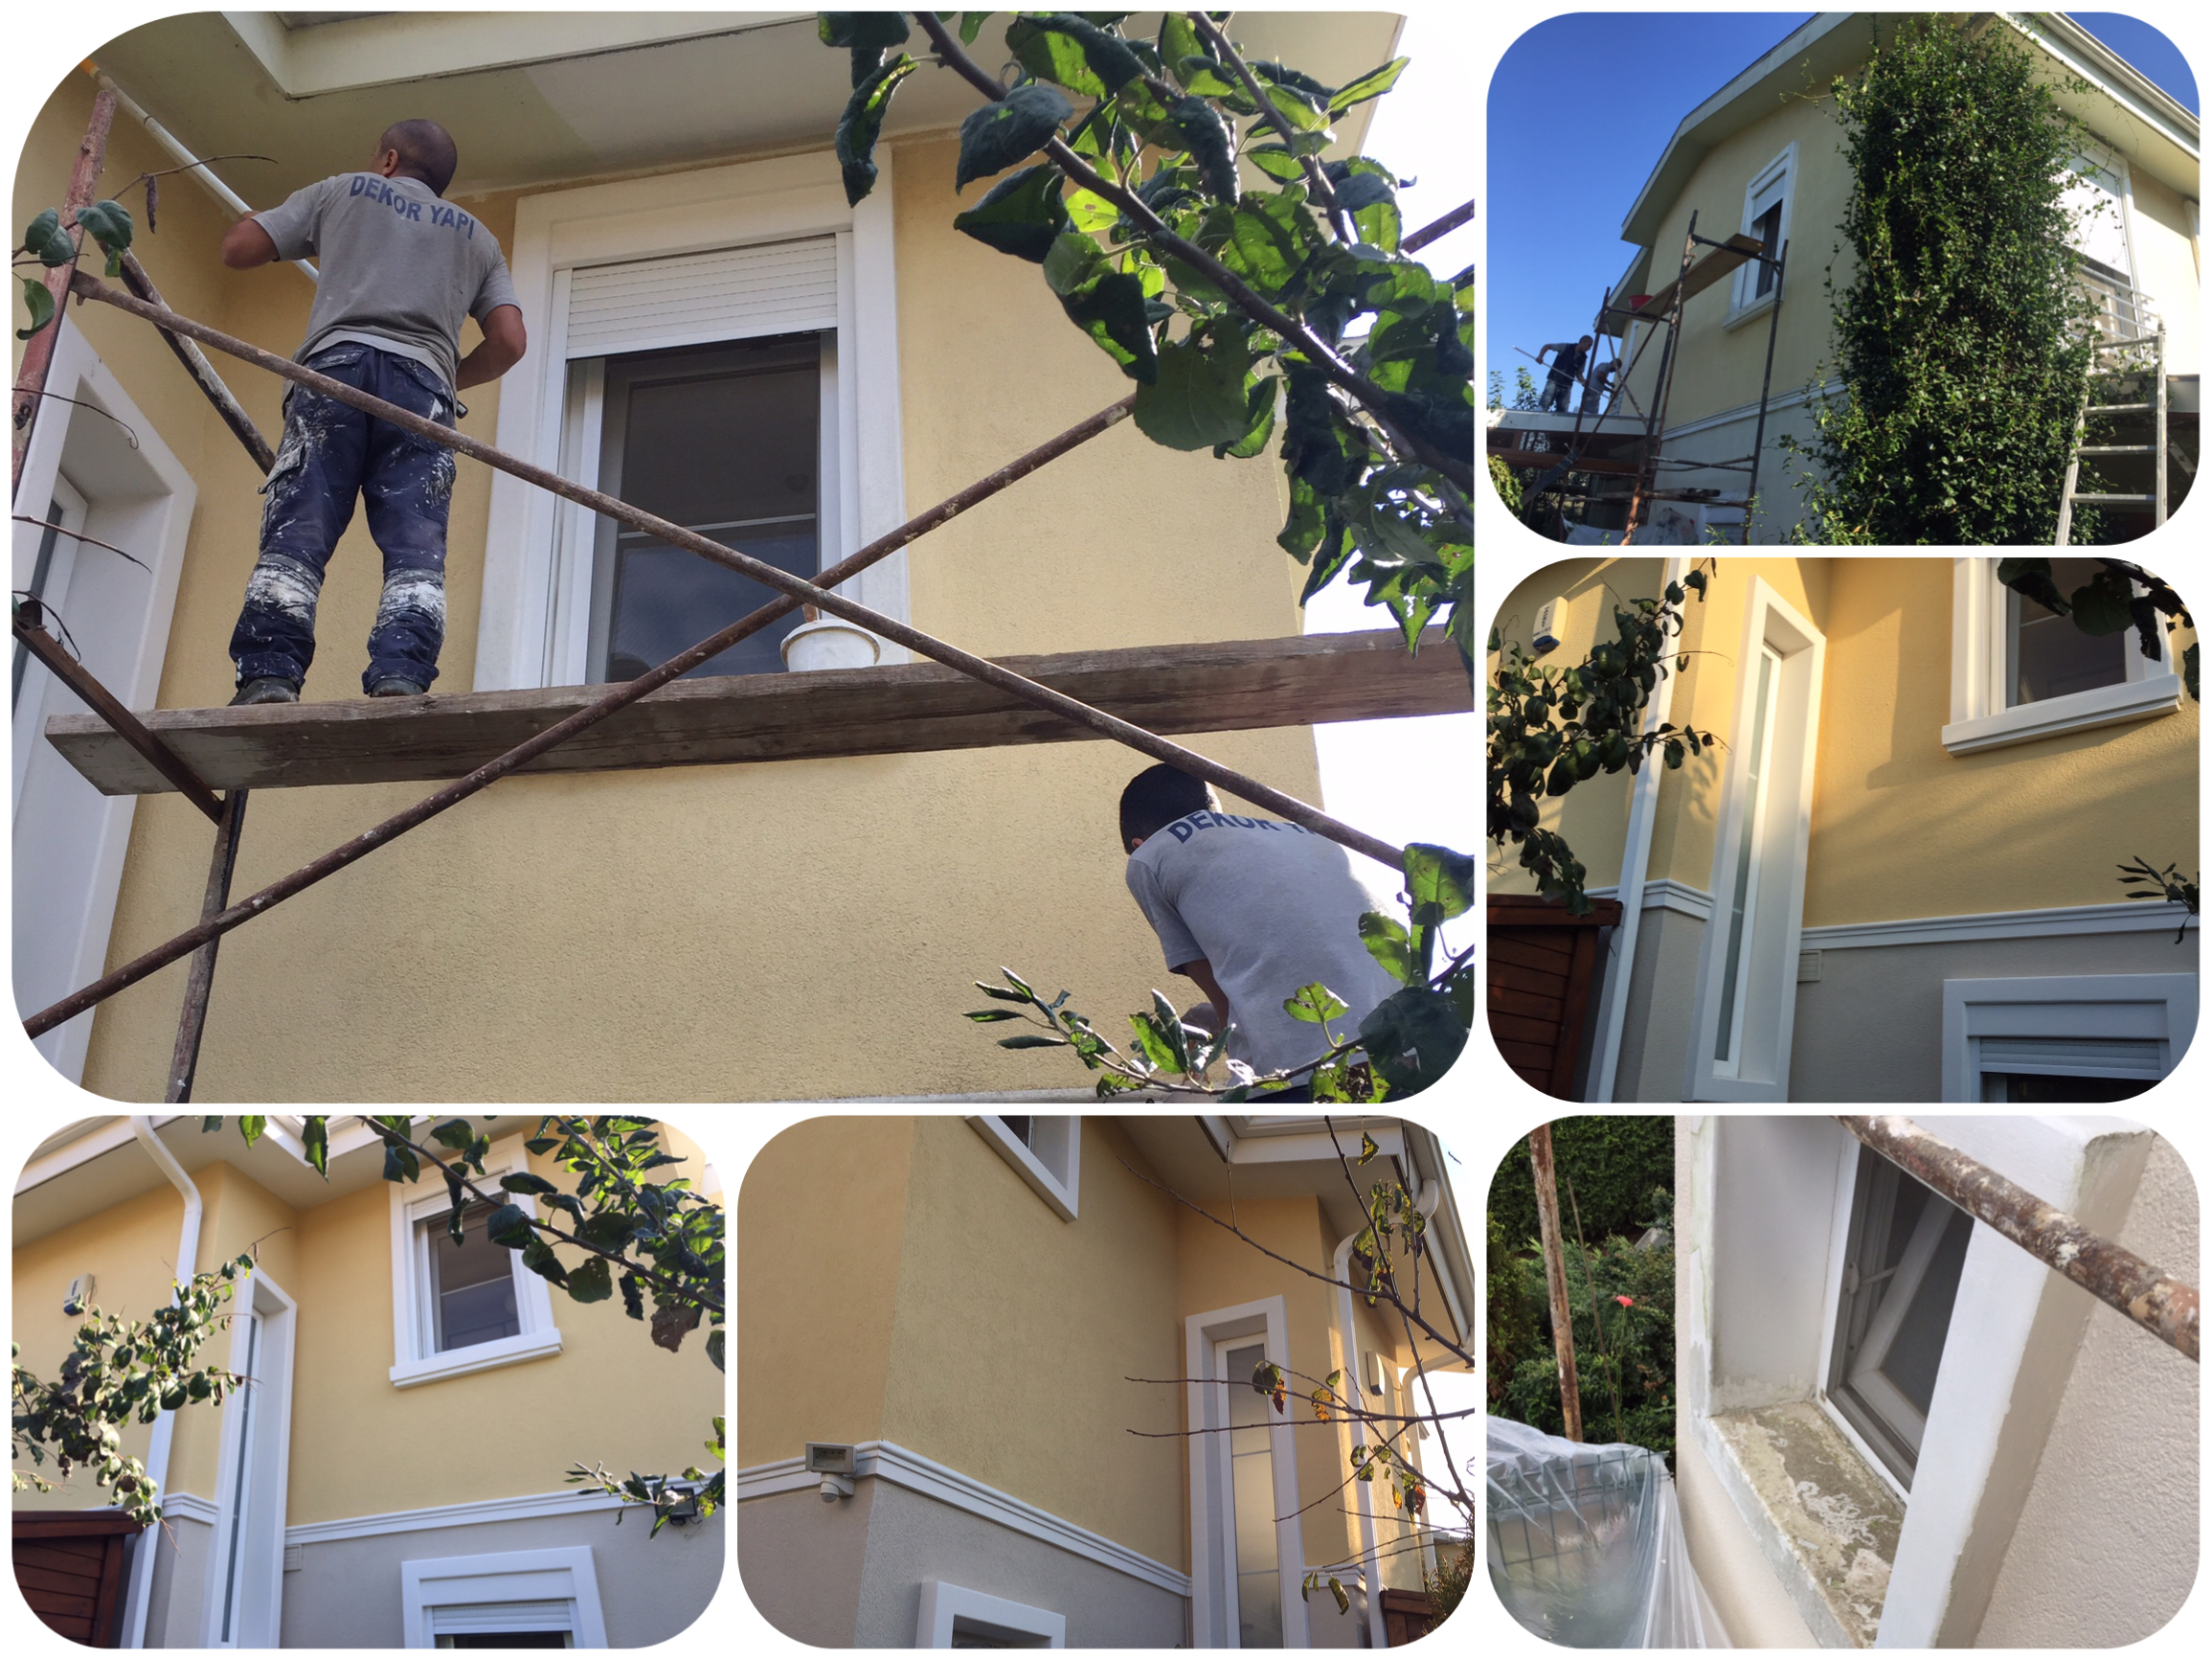 #en kaliteli güvenli villa boya ekibi